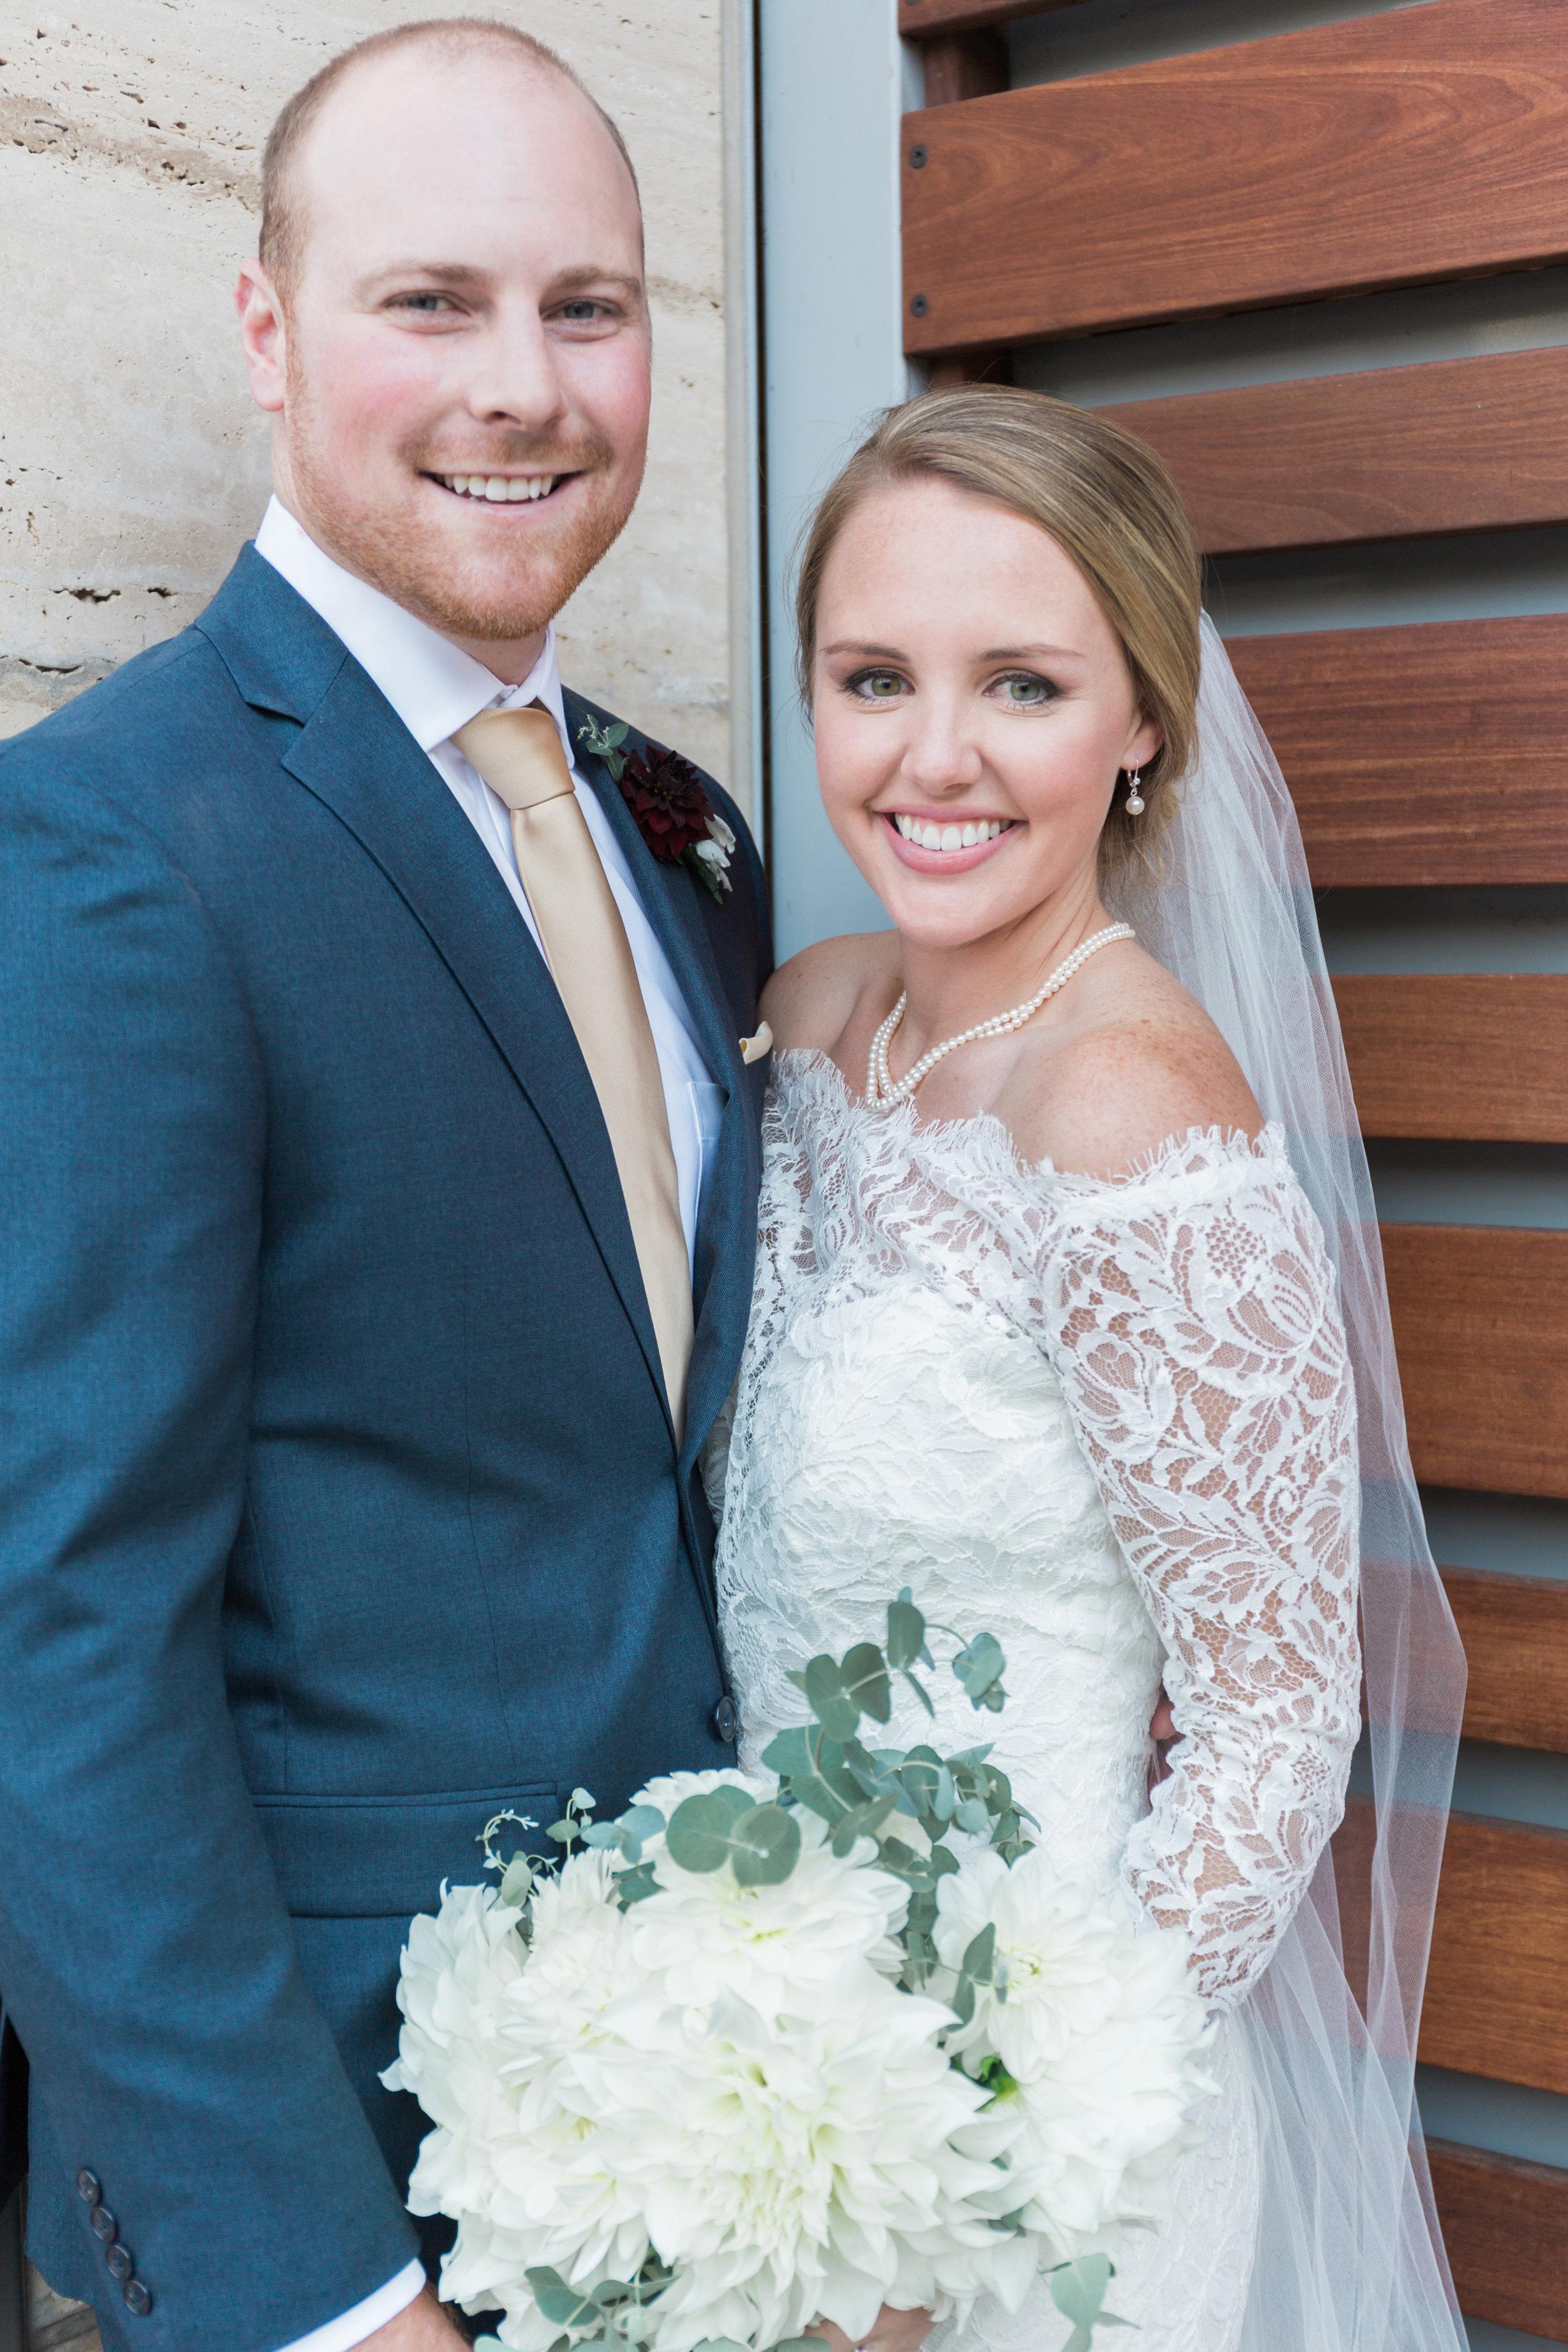 portland-bride-groom-portrait.jpg